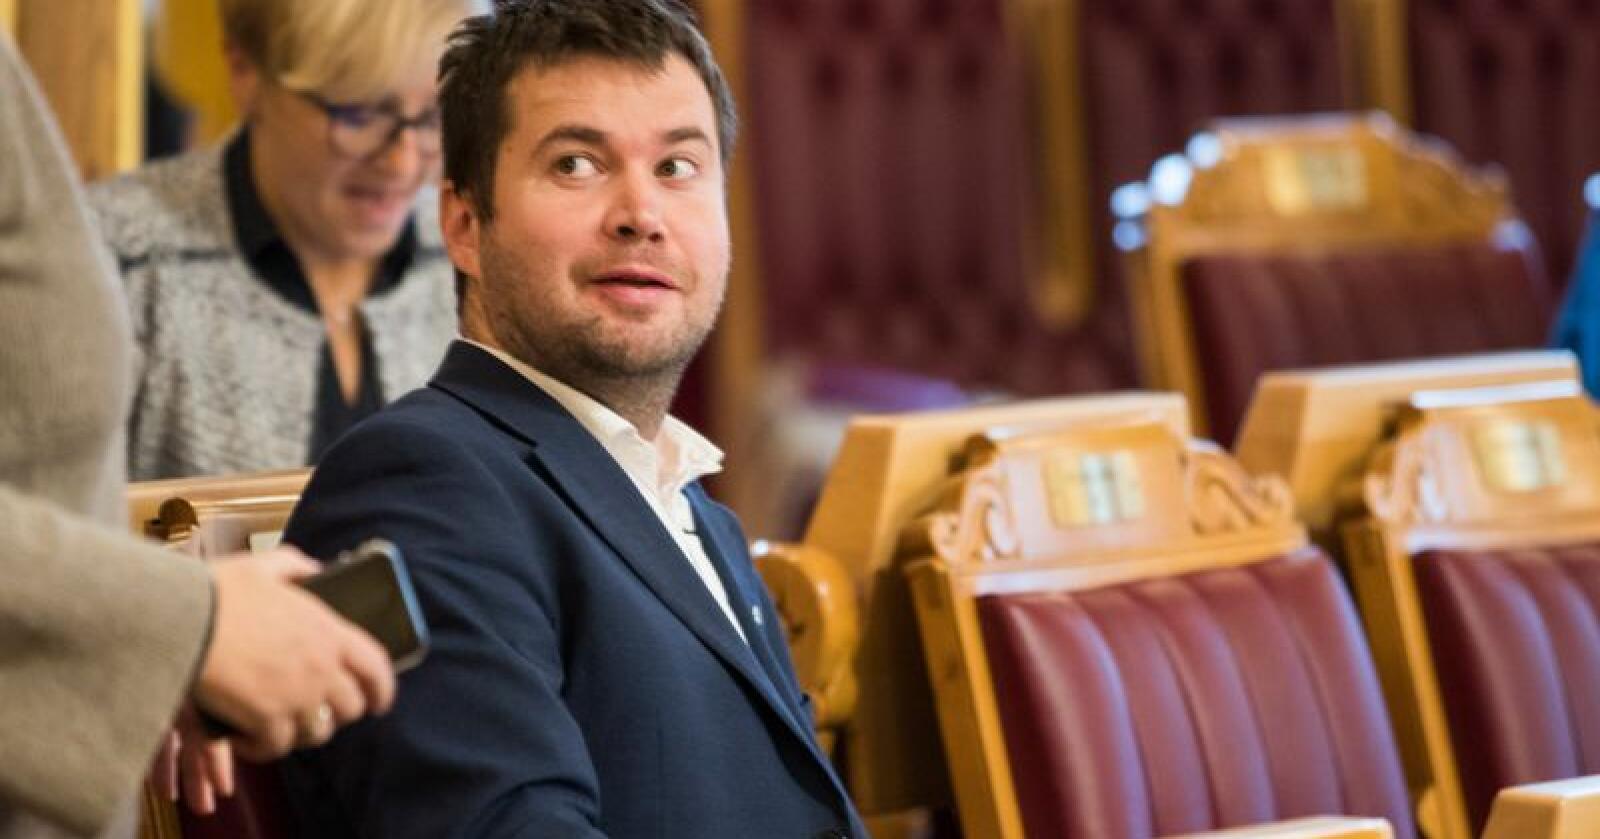 Sp-representant Geir Pollestad mener de dømte i Nav-saken har en moralsk skyld selv om de har brutt en ugyldig regel. Foto: Berit Roald / NTB scanpix